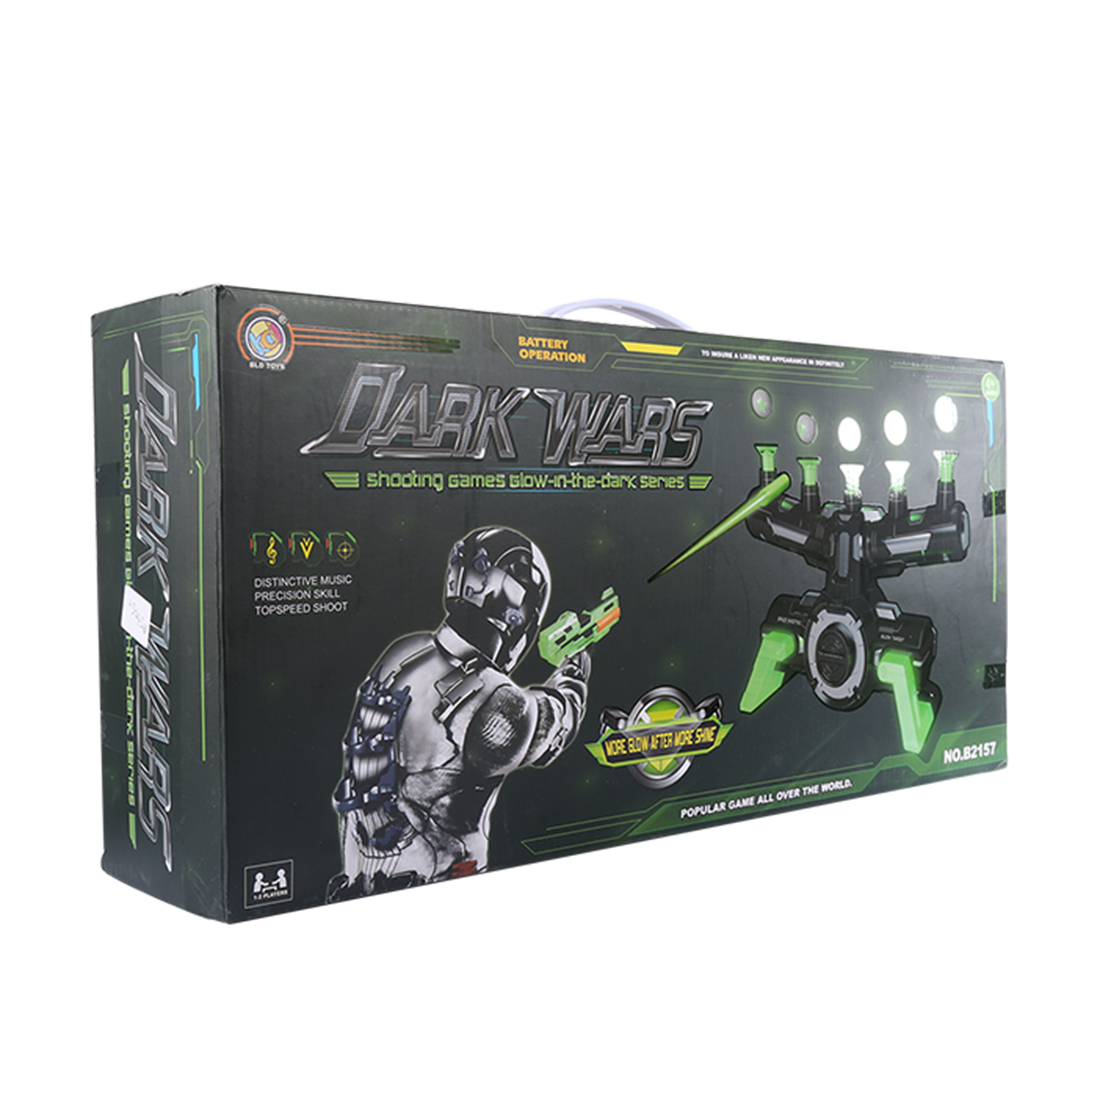 Electrodynamics Suspension Soft Bullet Shooting Toy and Suspension Dart Board Set(Luminous Version) - Black-green